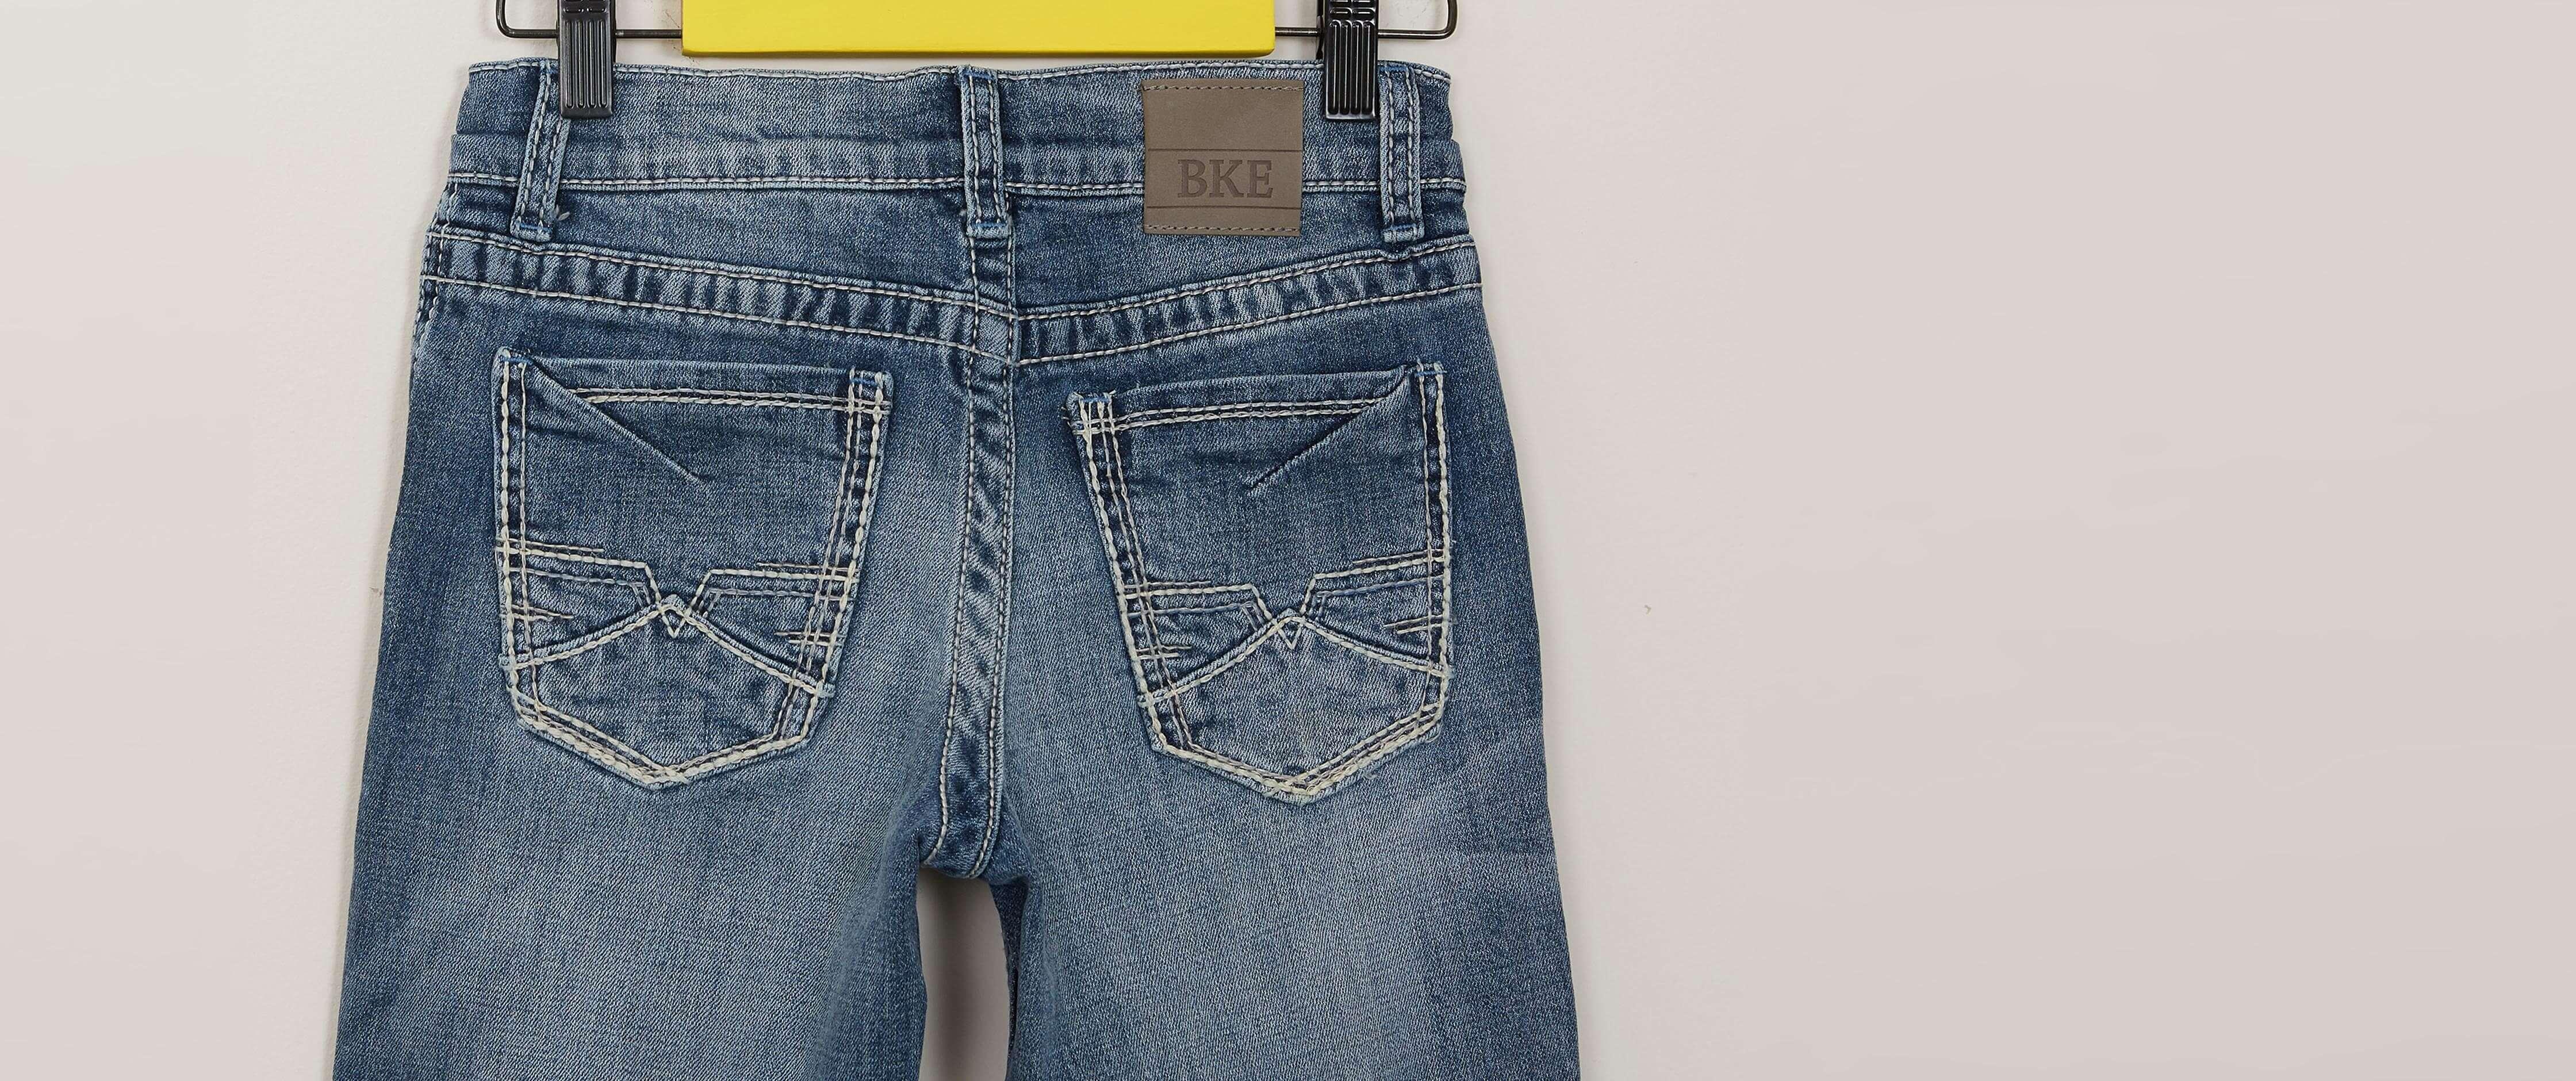 85ec71e1 Boys - BKE Conner Straight Stretch Jean [6XuXh1811518] - $31.99